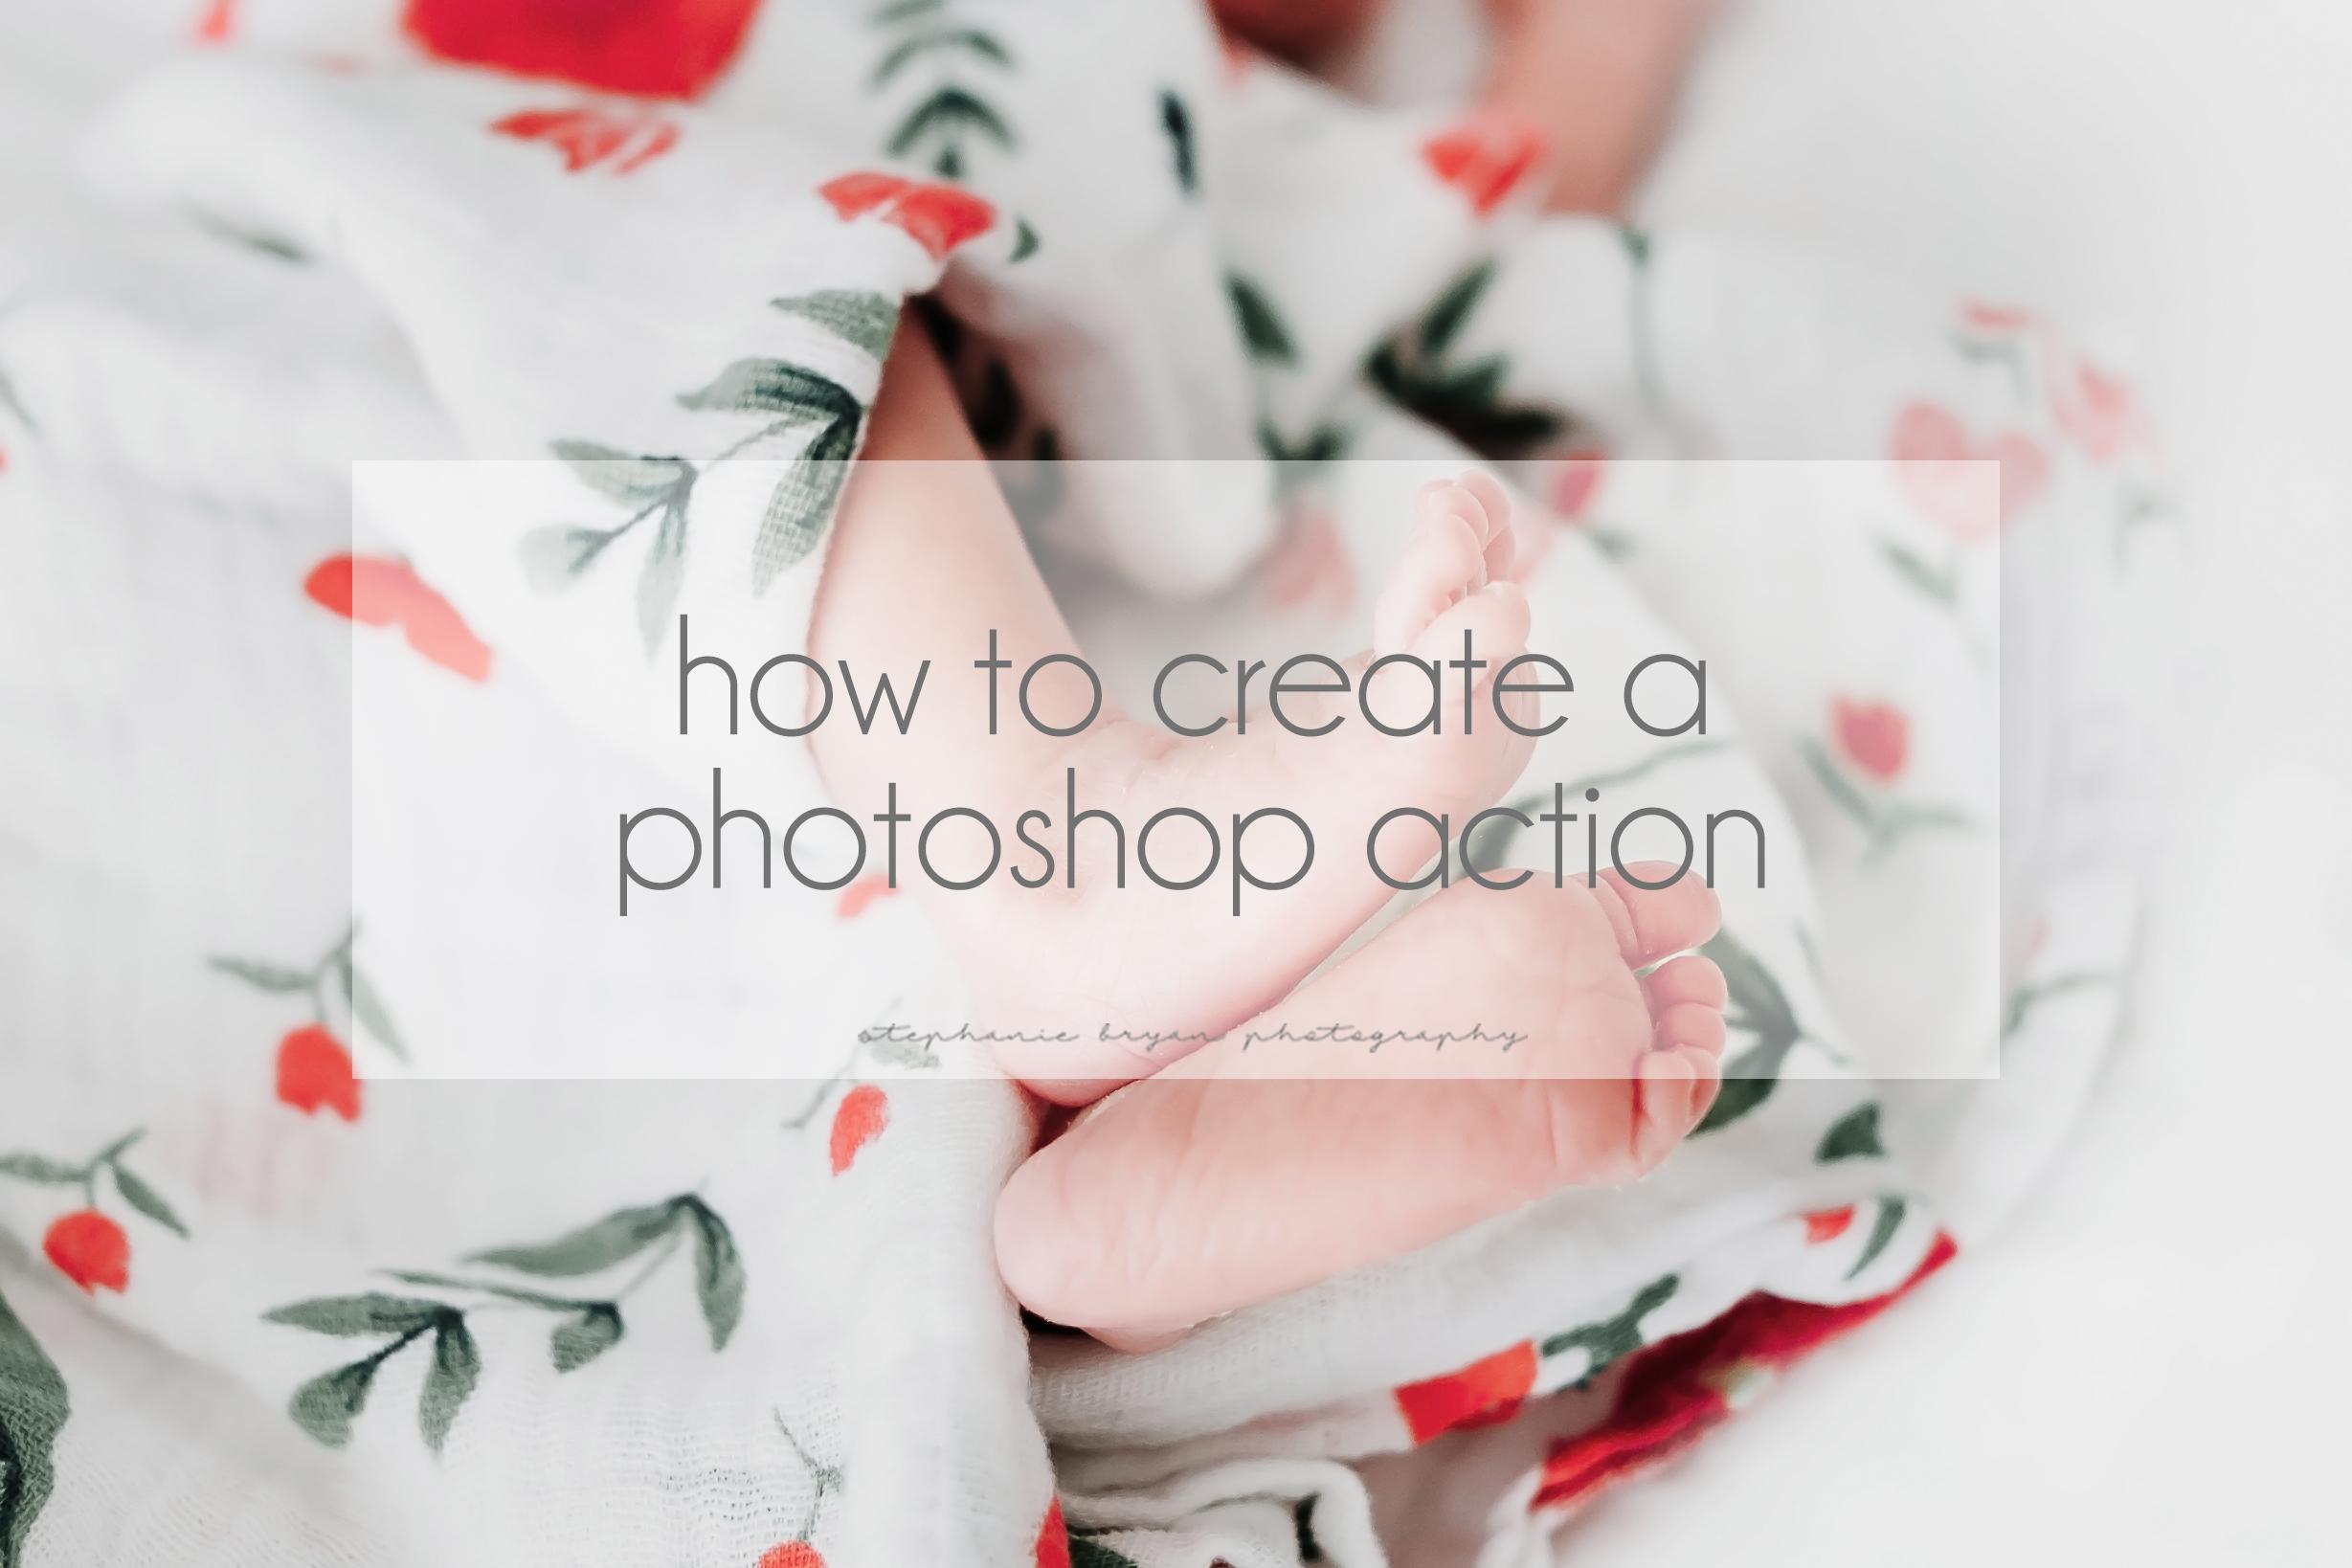 stephaniebryanphotography_howtocreateapsaction.jpg